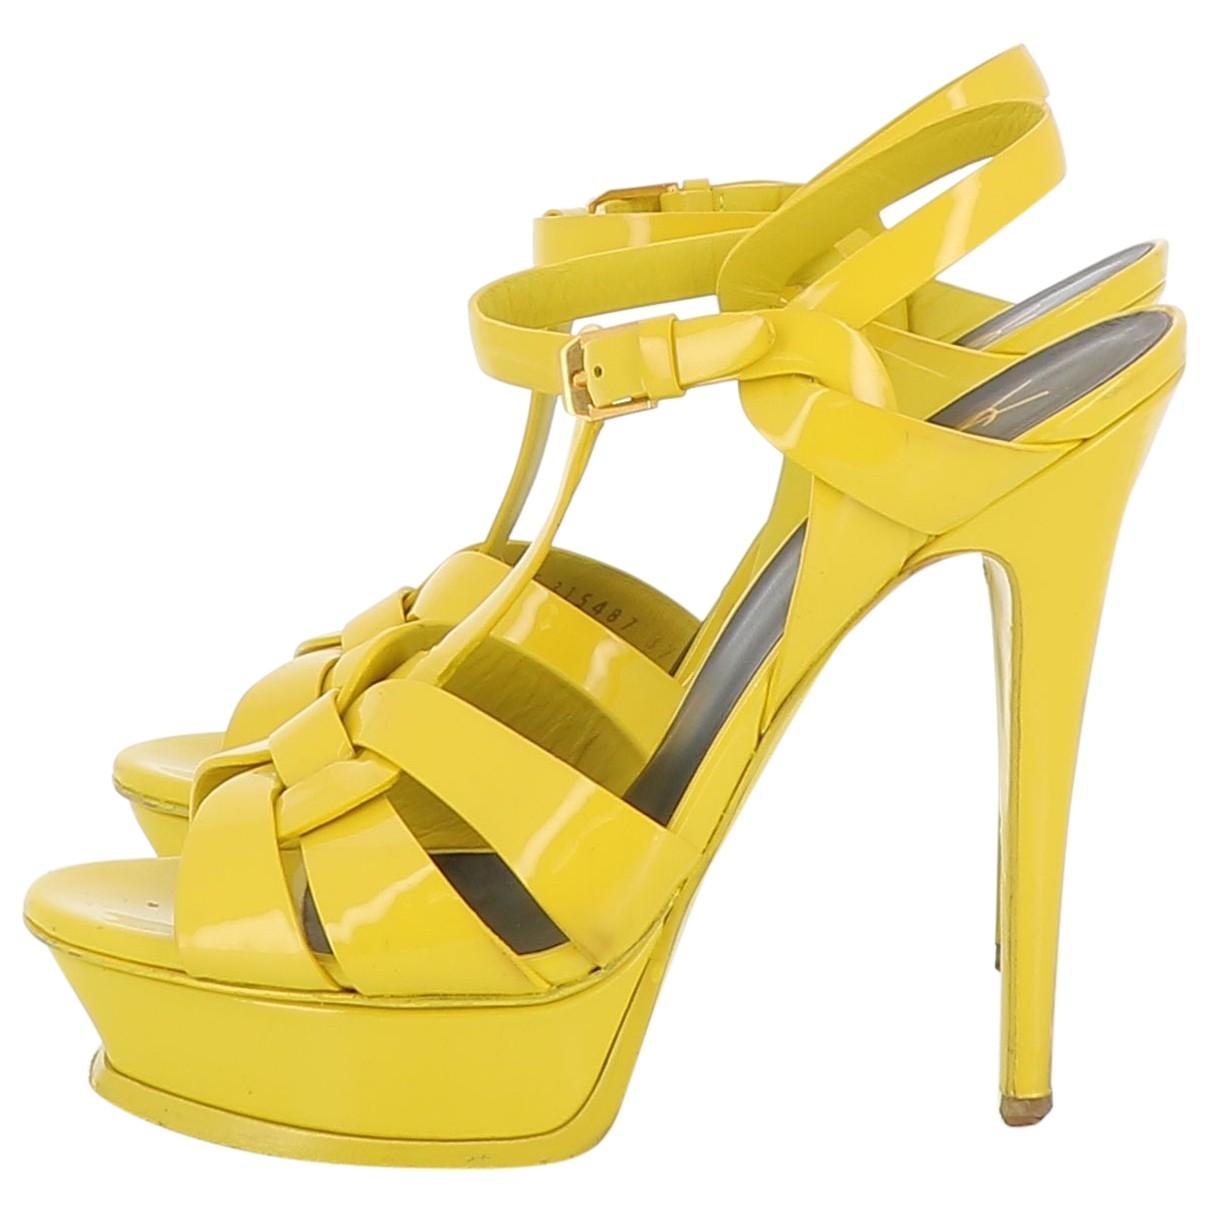 Yves Saint Laurent Tribute Sandalen in  Gelb Lackleder